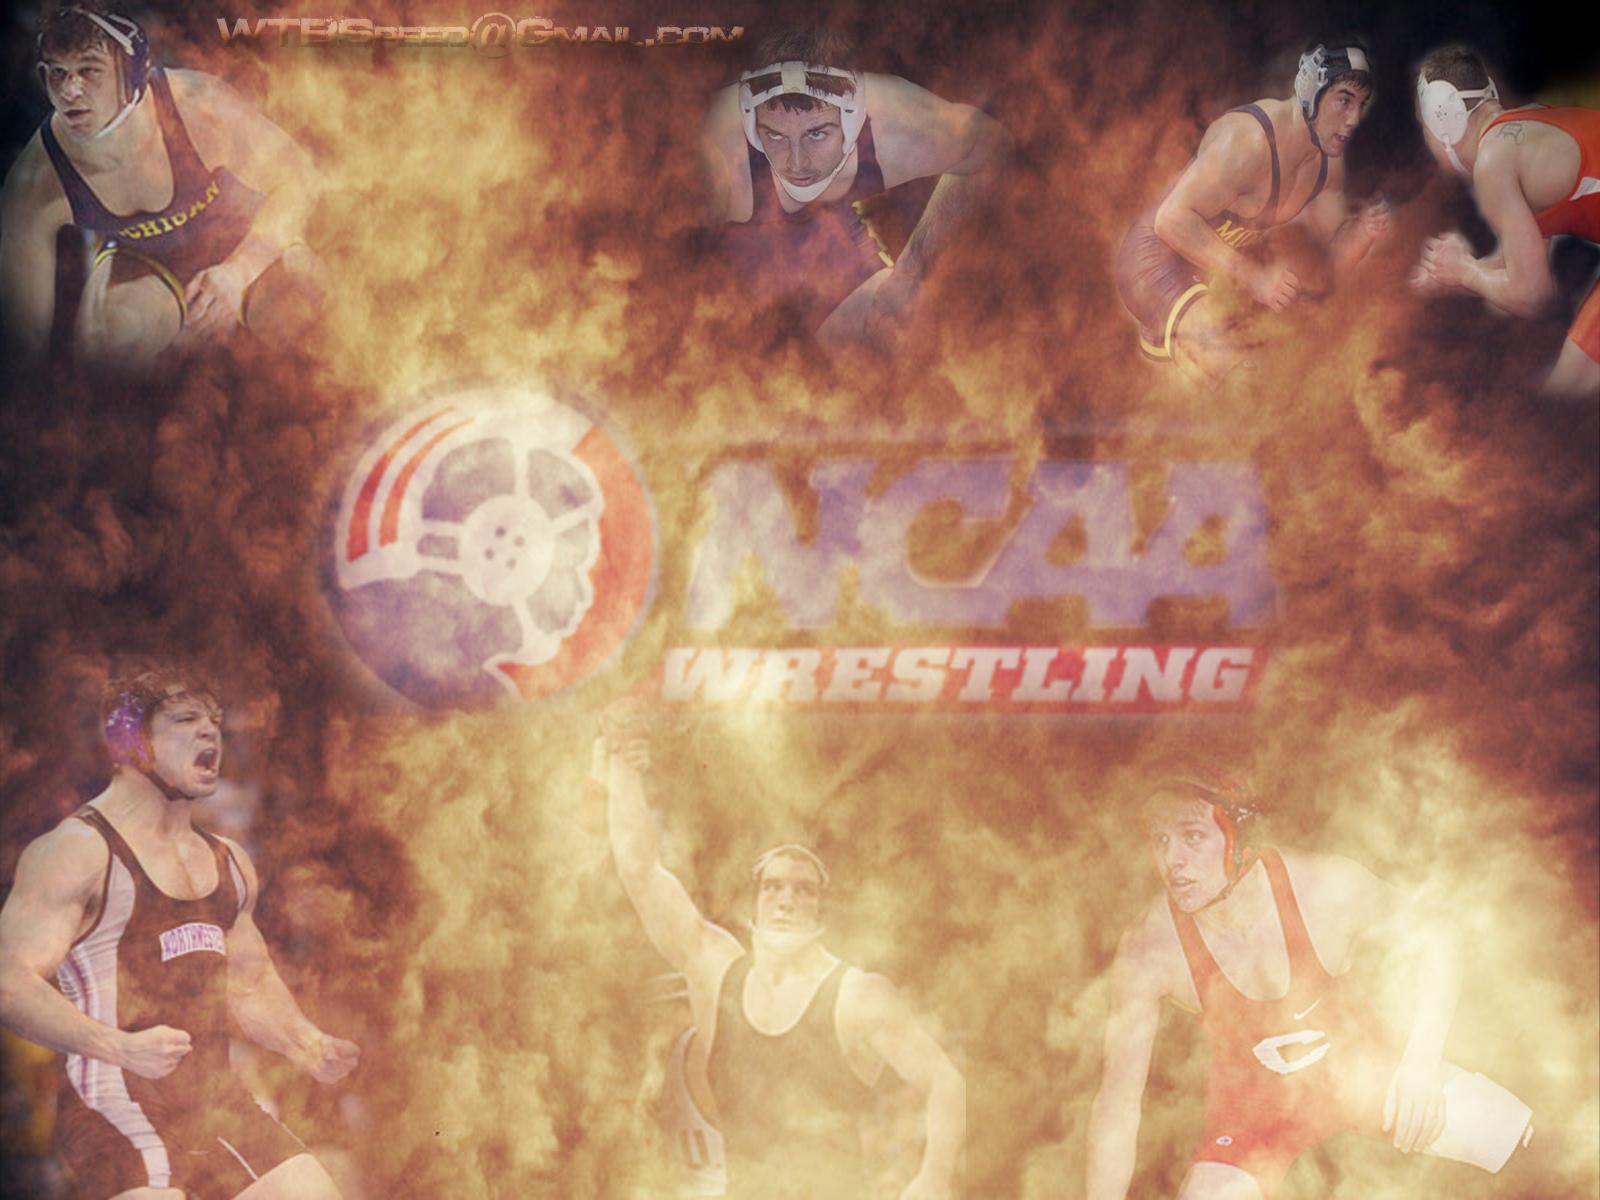 Ncaa wrestling wallpaper